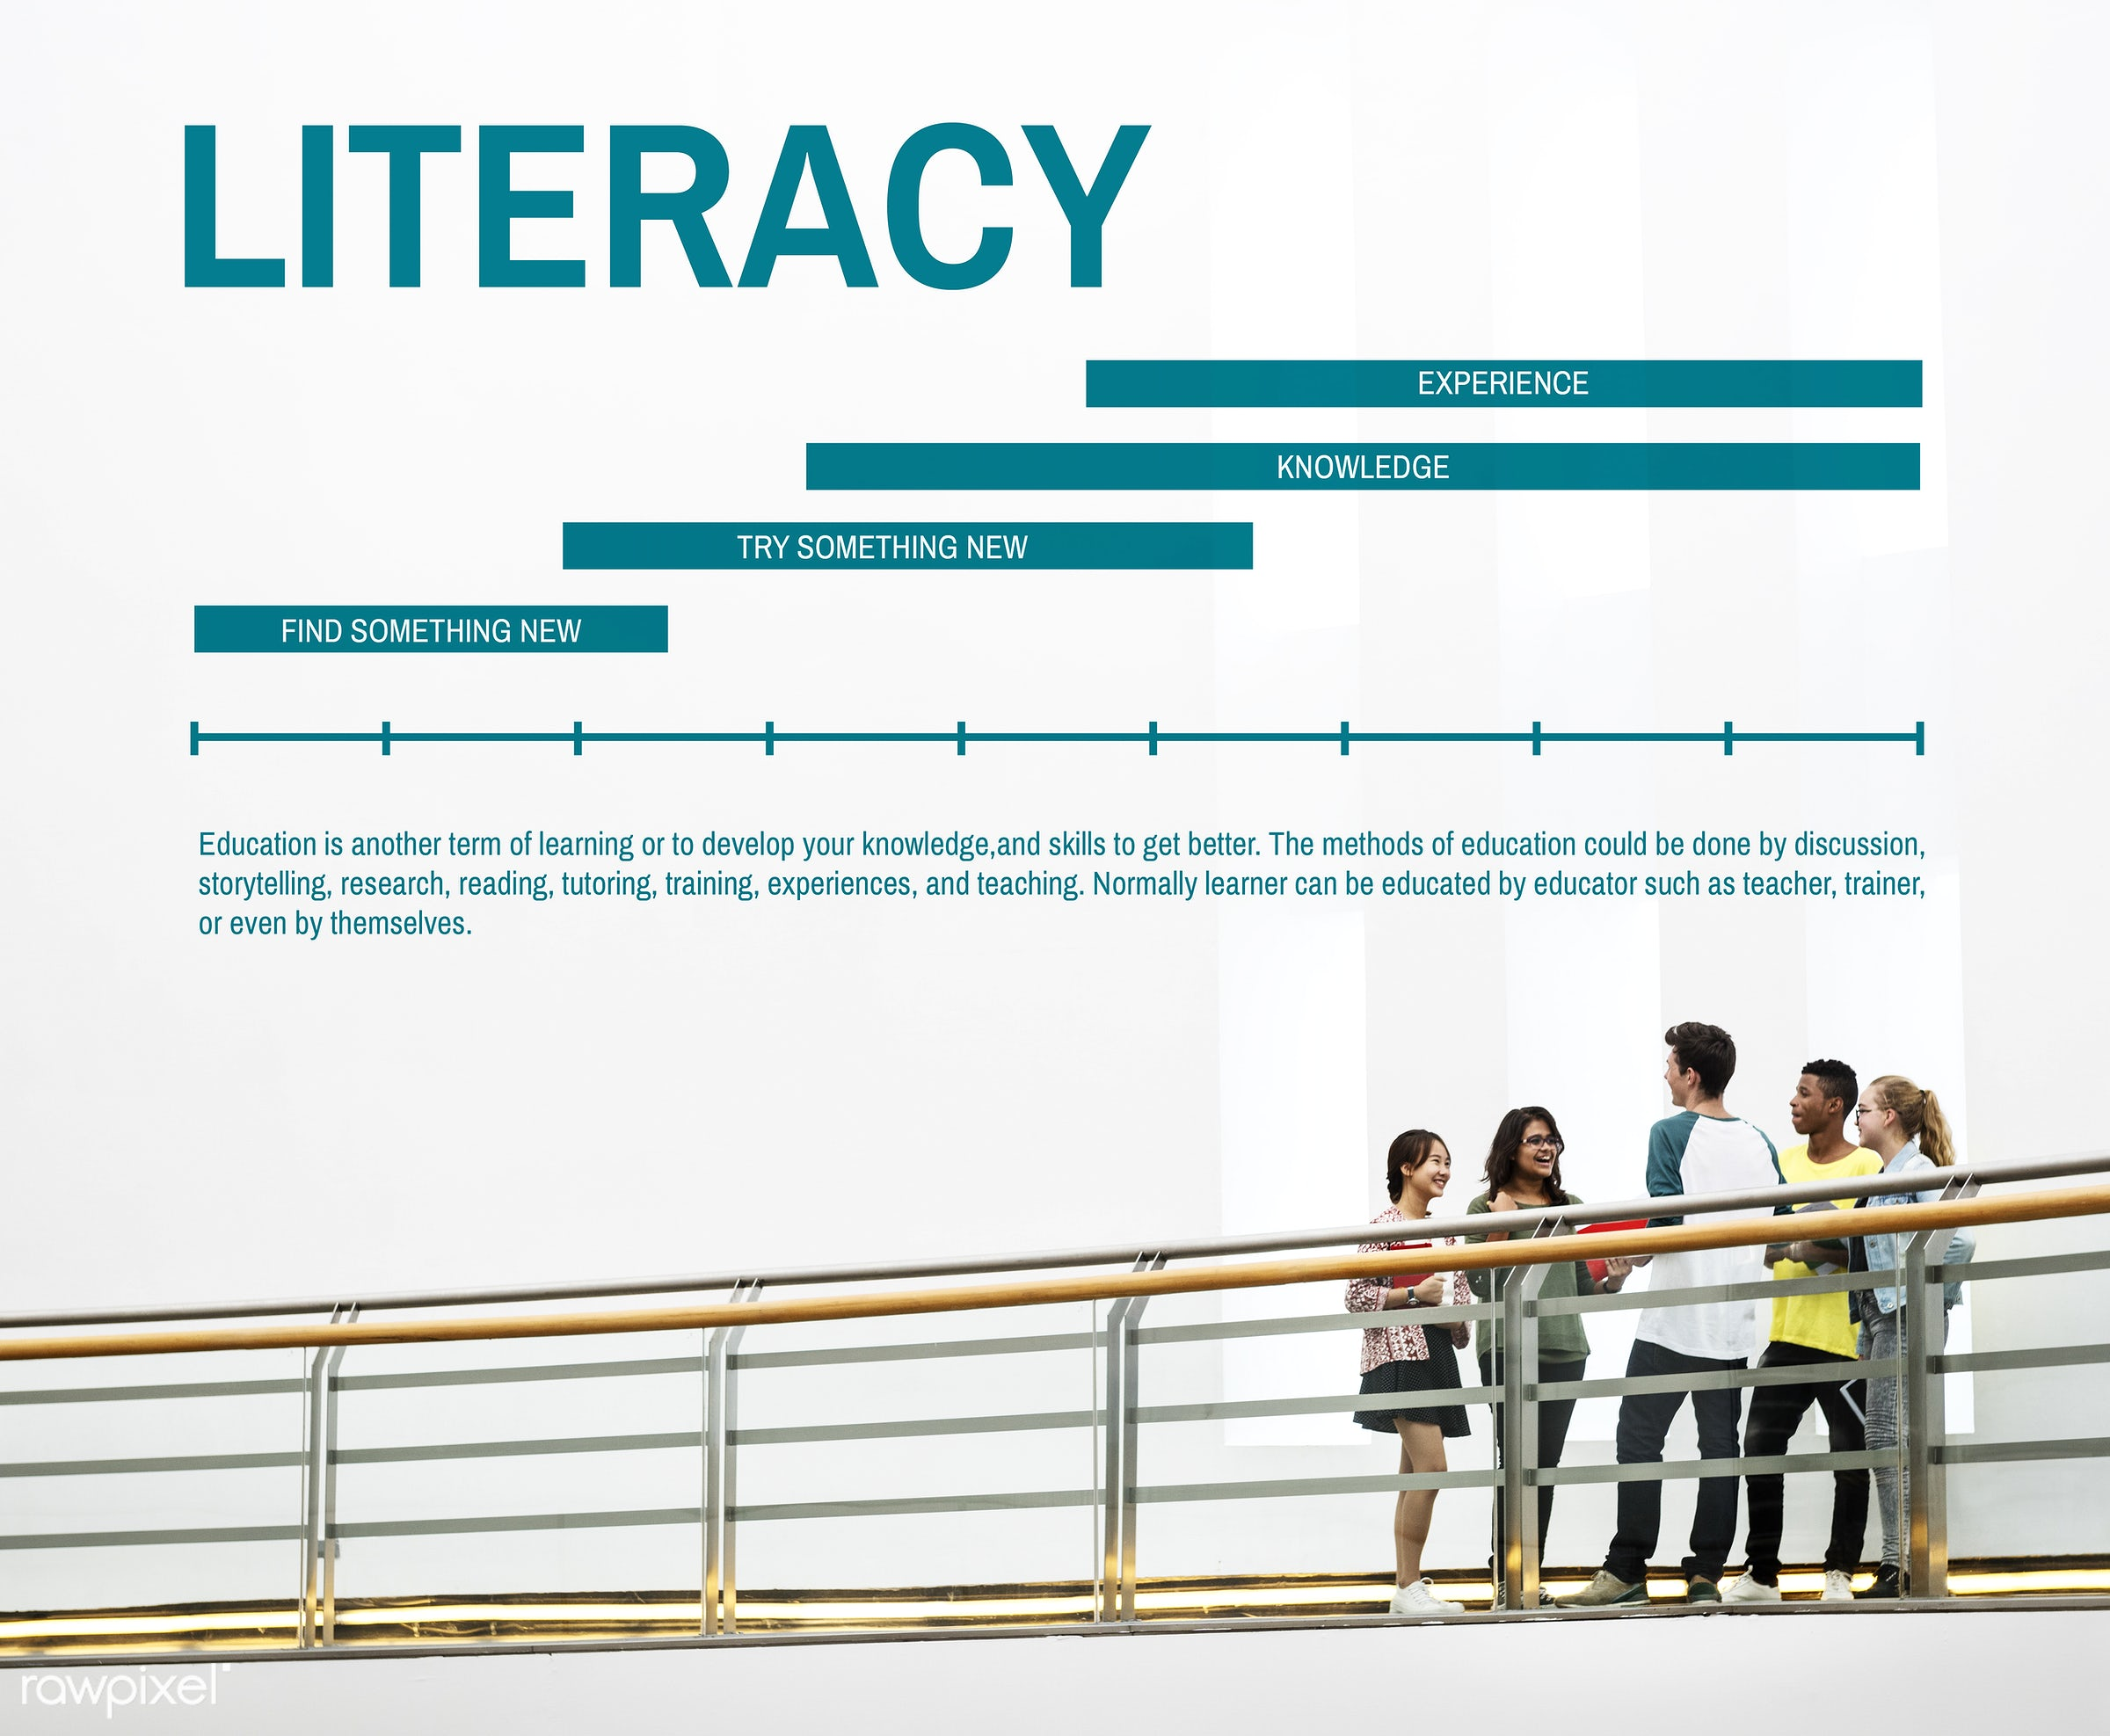 academics, book, books, boy, bridge, carrying, college, communication, degree, development, education, experience, friends,...